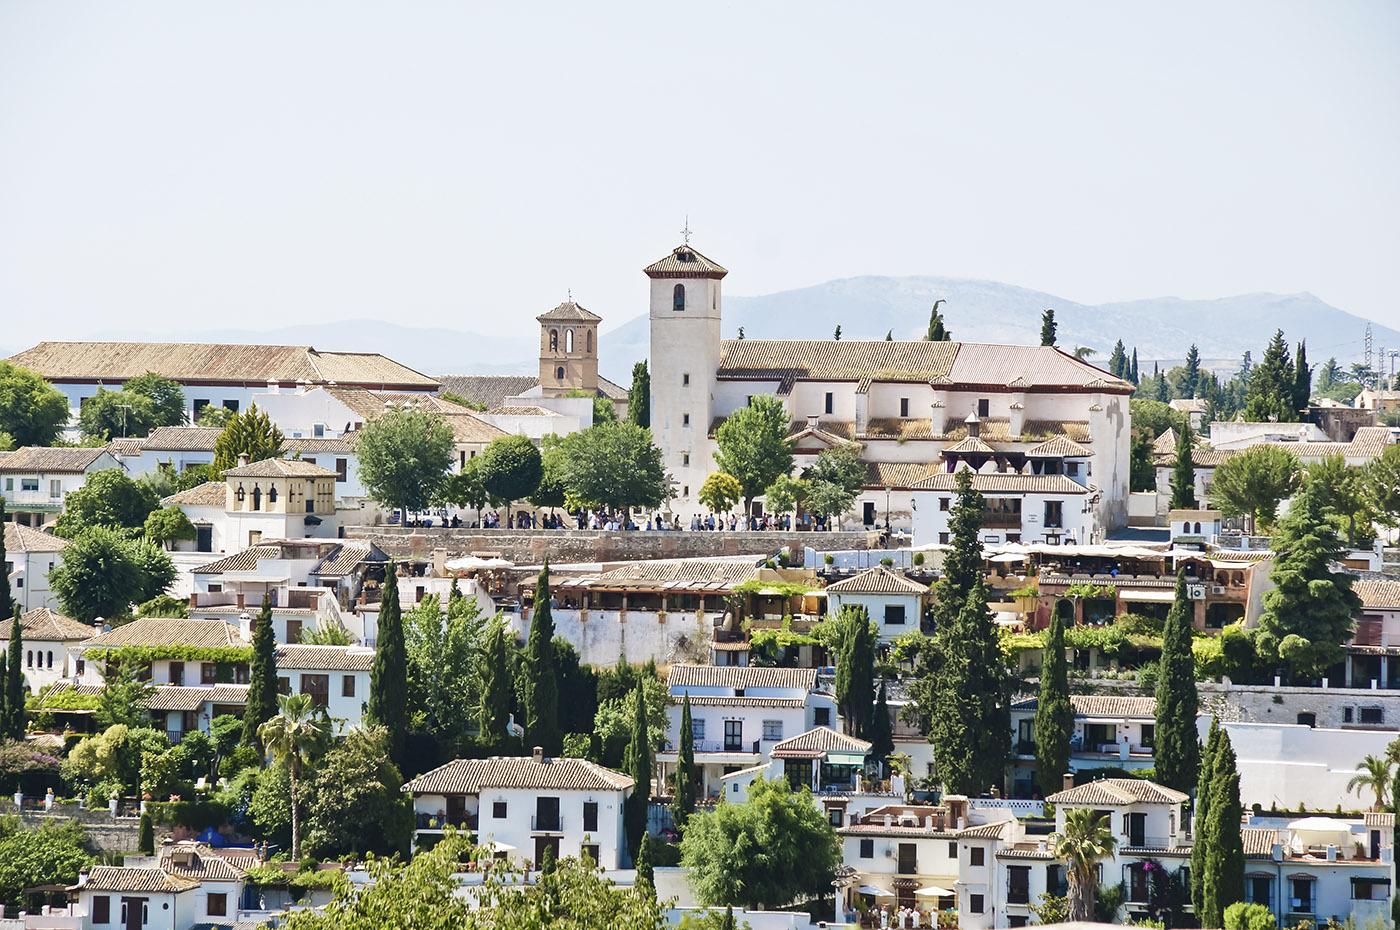 Panorama de l'Albaicin, Grenade, Andalousie